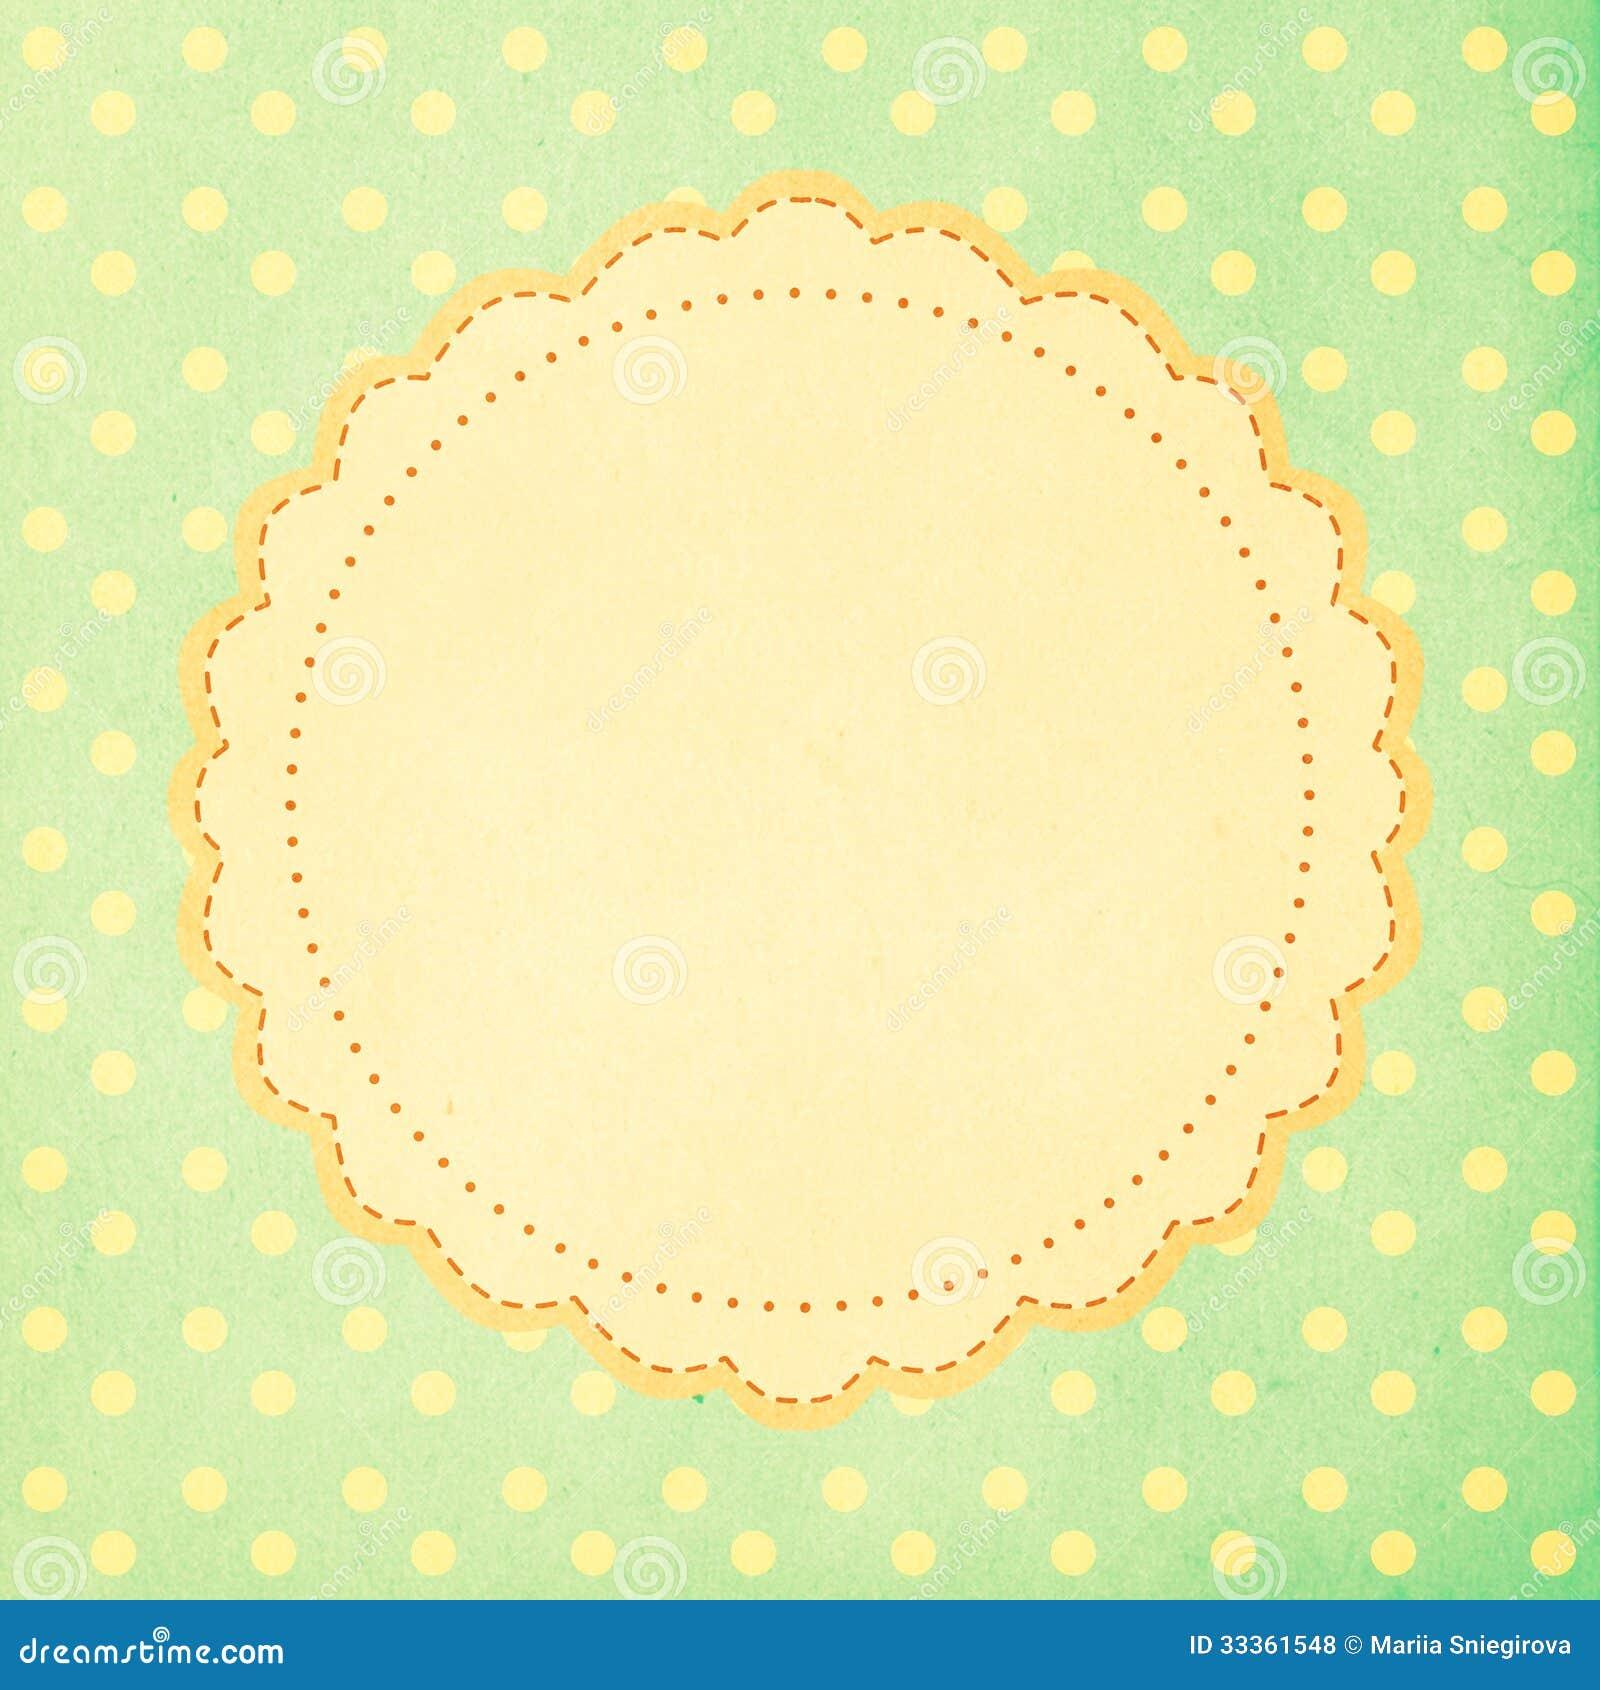 Vintage Background Polka Dot Style Royalty Free Stock